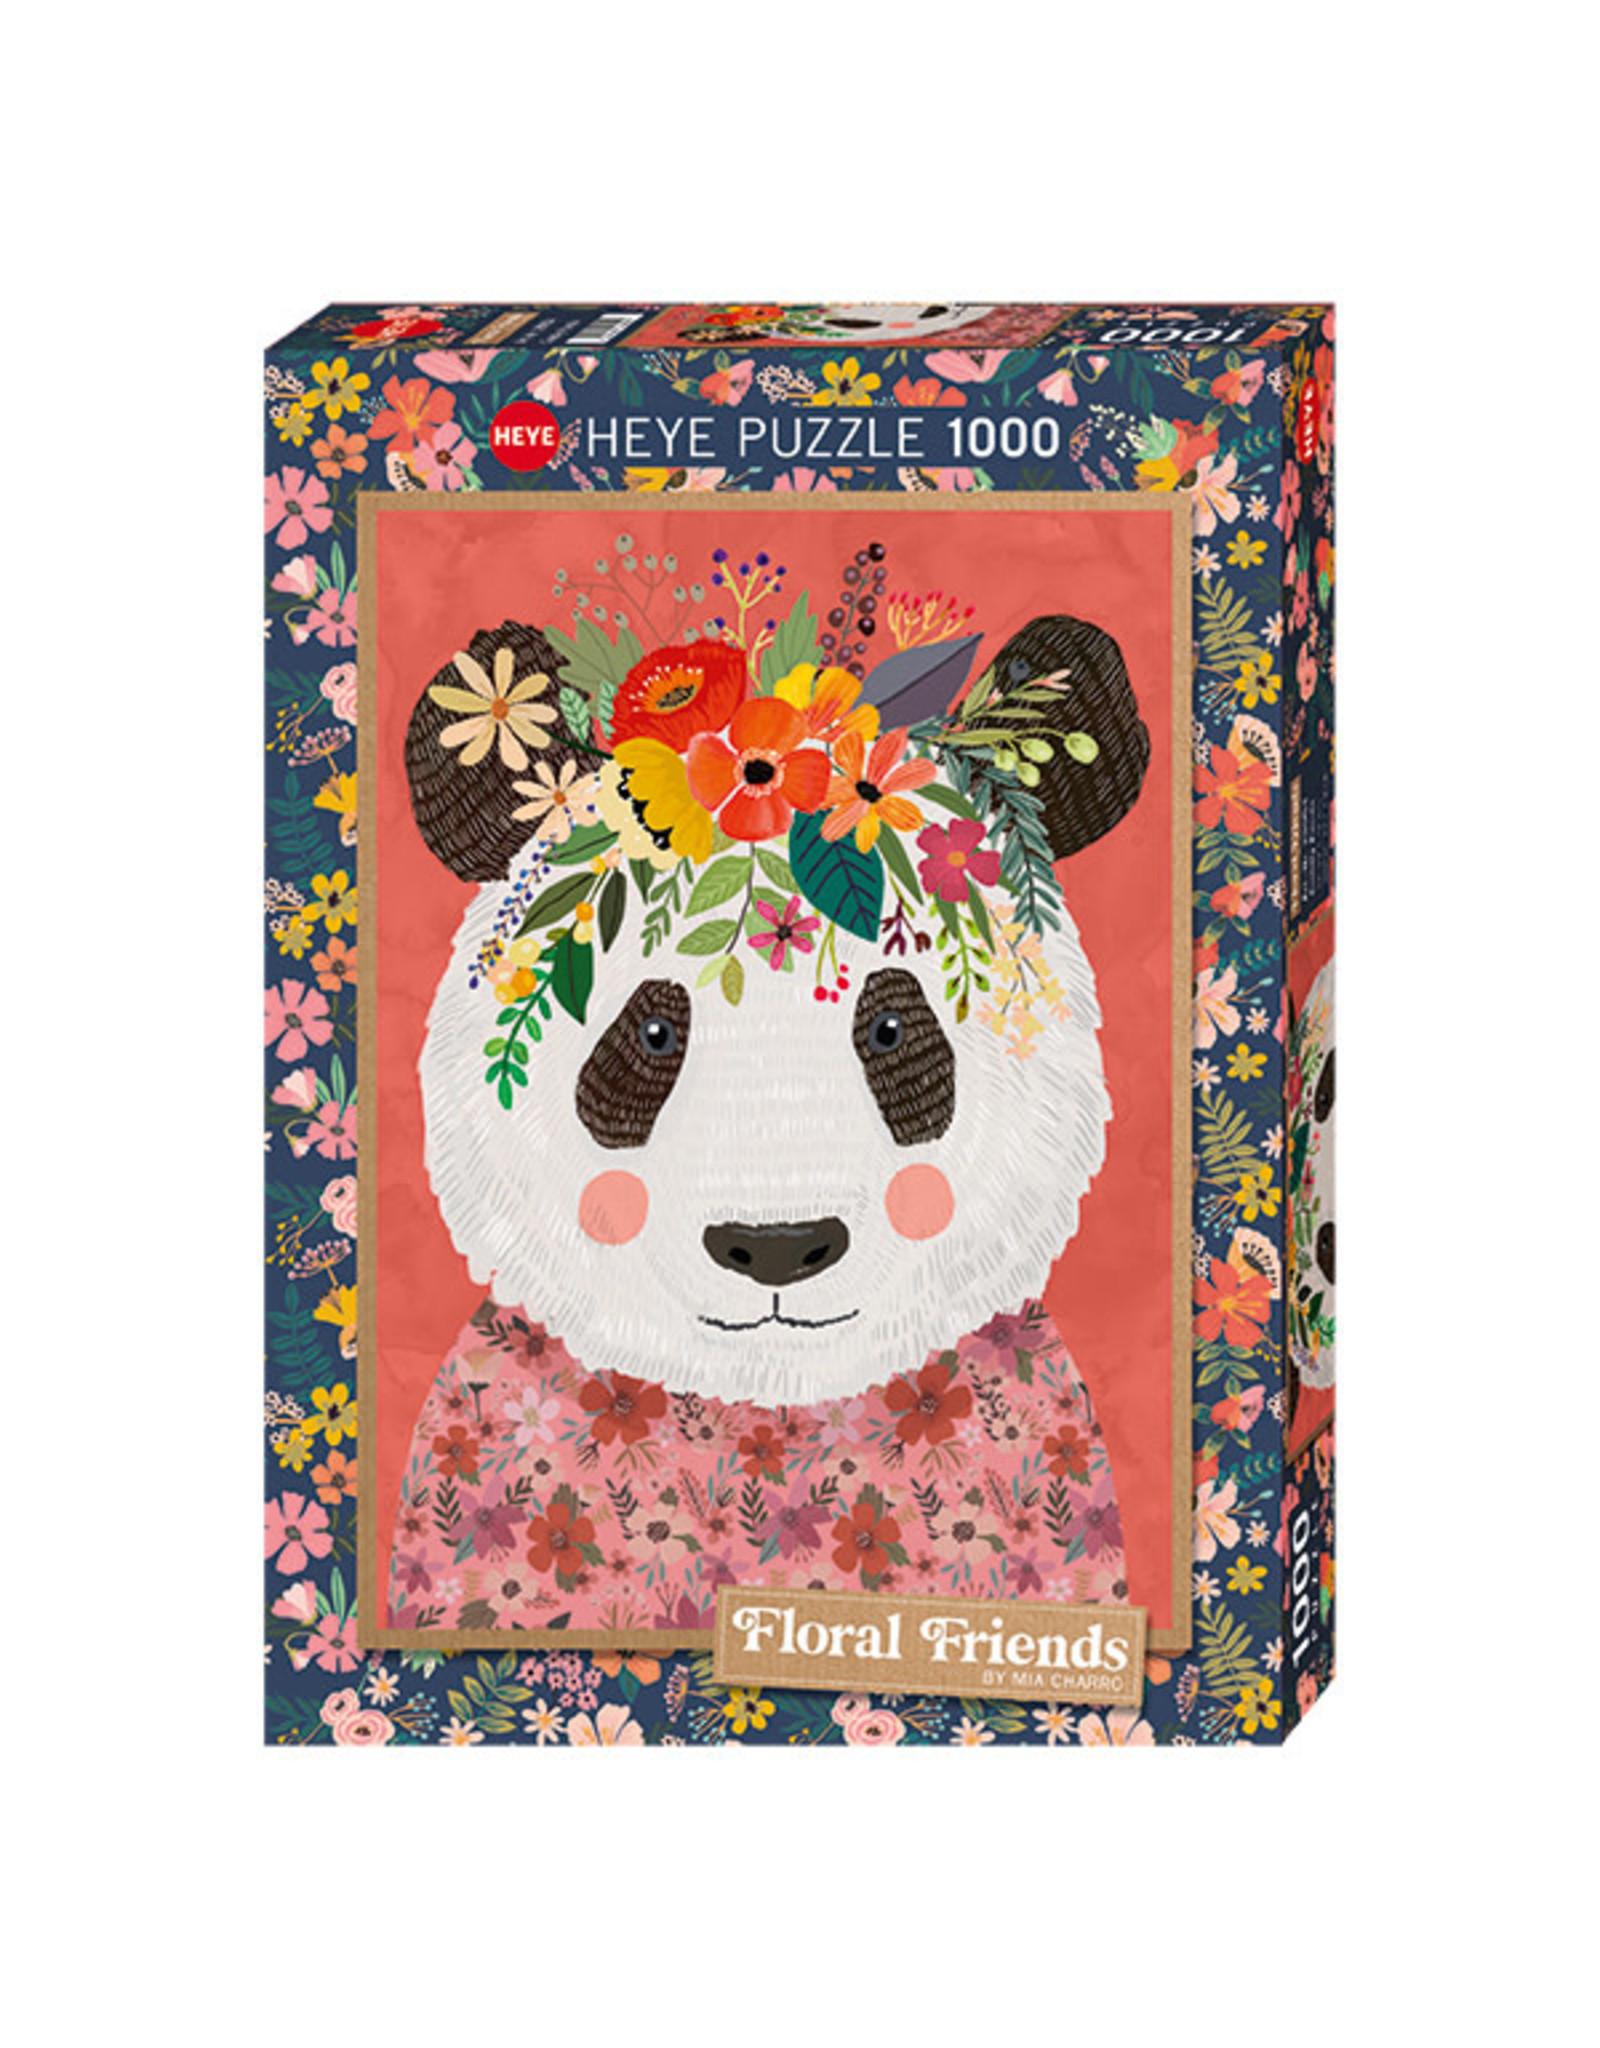 Heye Floral Friends (1000 piece) - Cuddly Panda